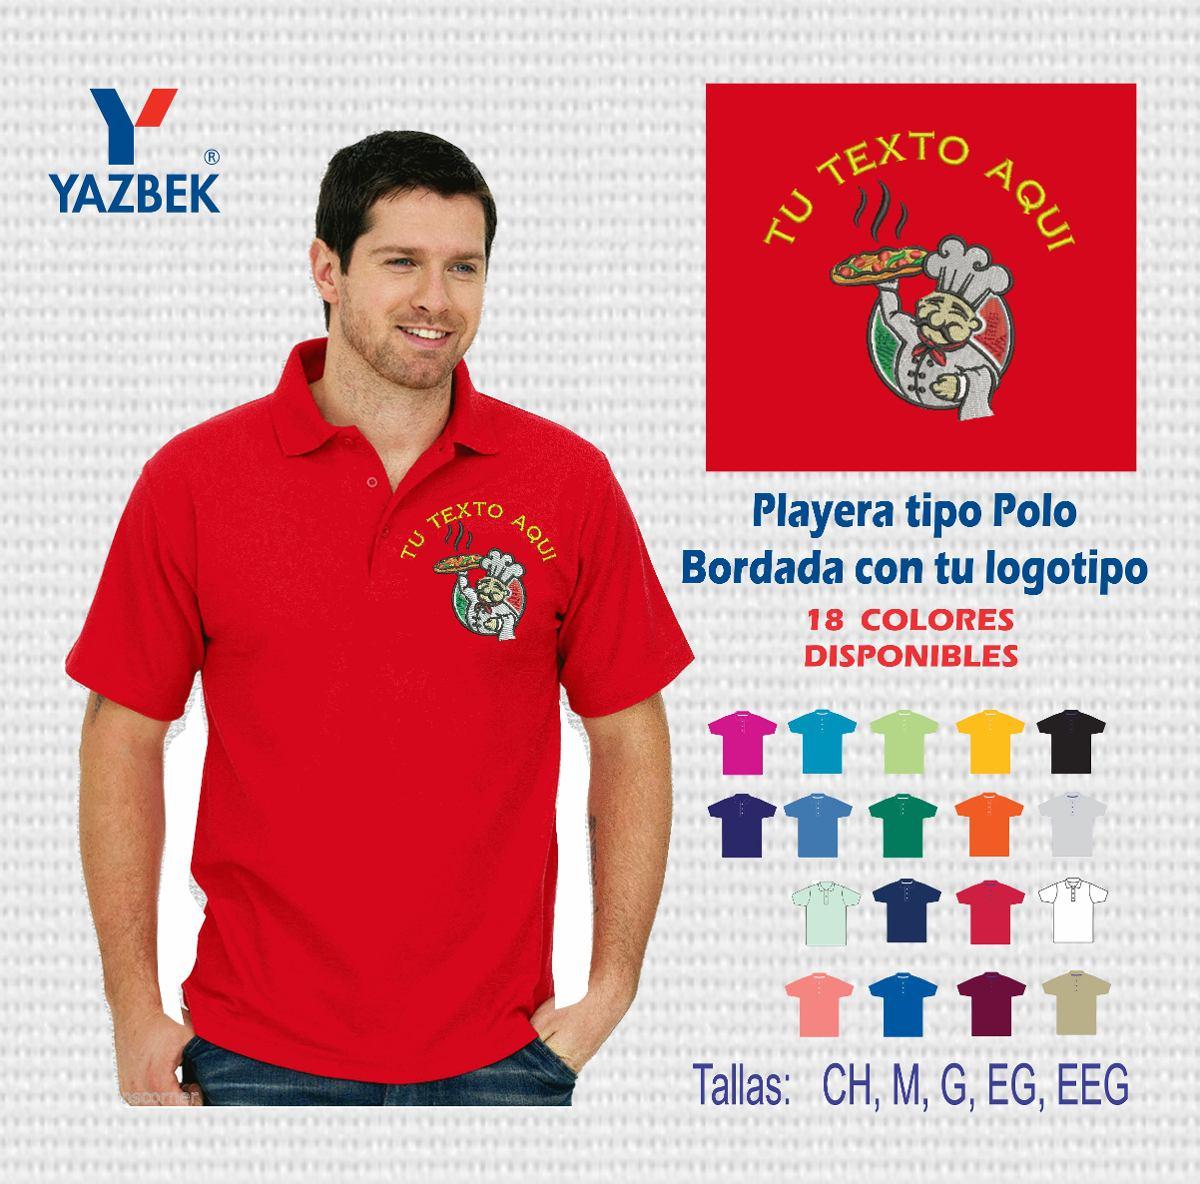 Uniformes Industrial P polo Con Logo Pedi min 12 Piezas -   100.00 ... 5ccd66e6dc02f